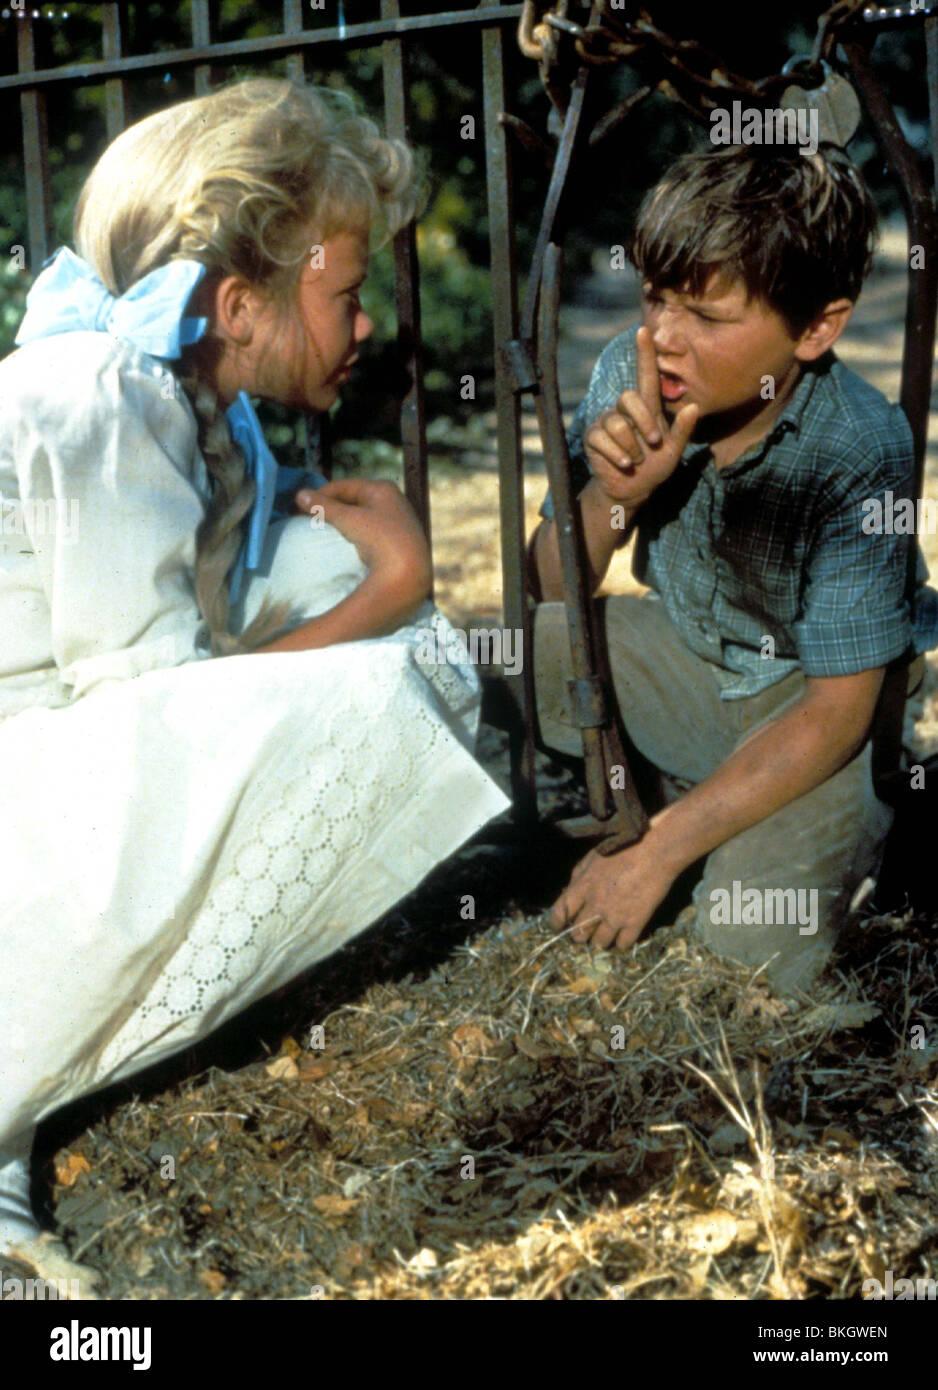 POLLYANNA (1960) HAYLEY MILLS, KEVIN CORCORAN PLYA 001 - Stock Image